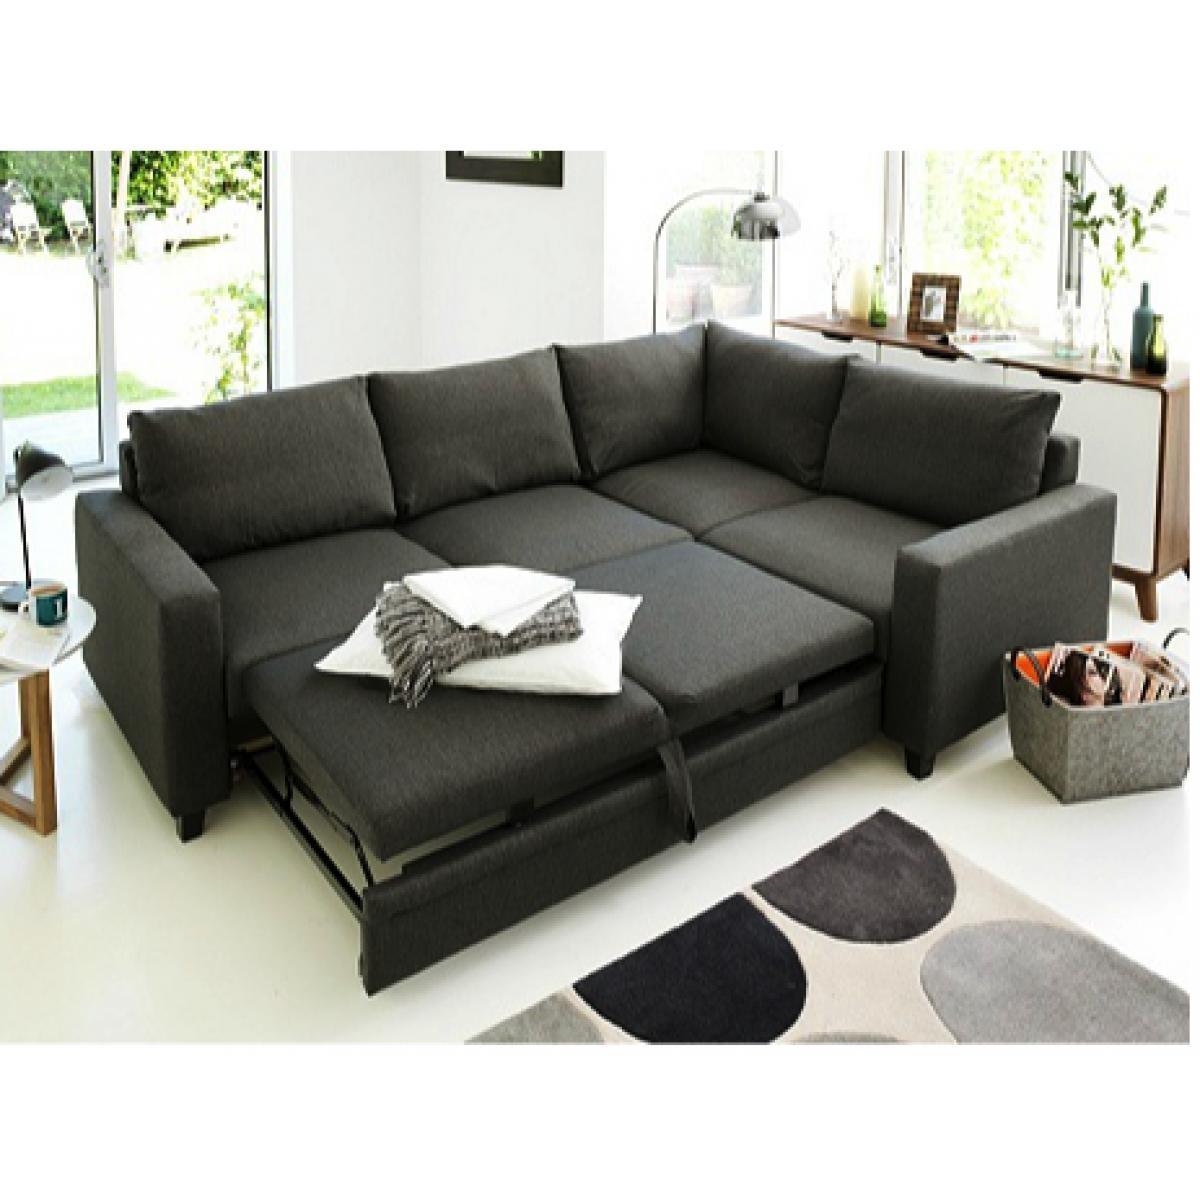 Jardan Sofa Bed – Leather Sectional Sofa Regarding Cheap Corner Sofa Bed (Image 9 of 20)